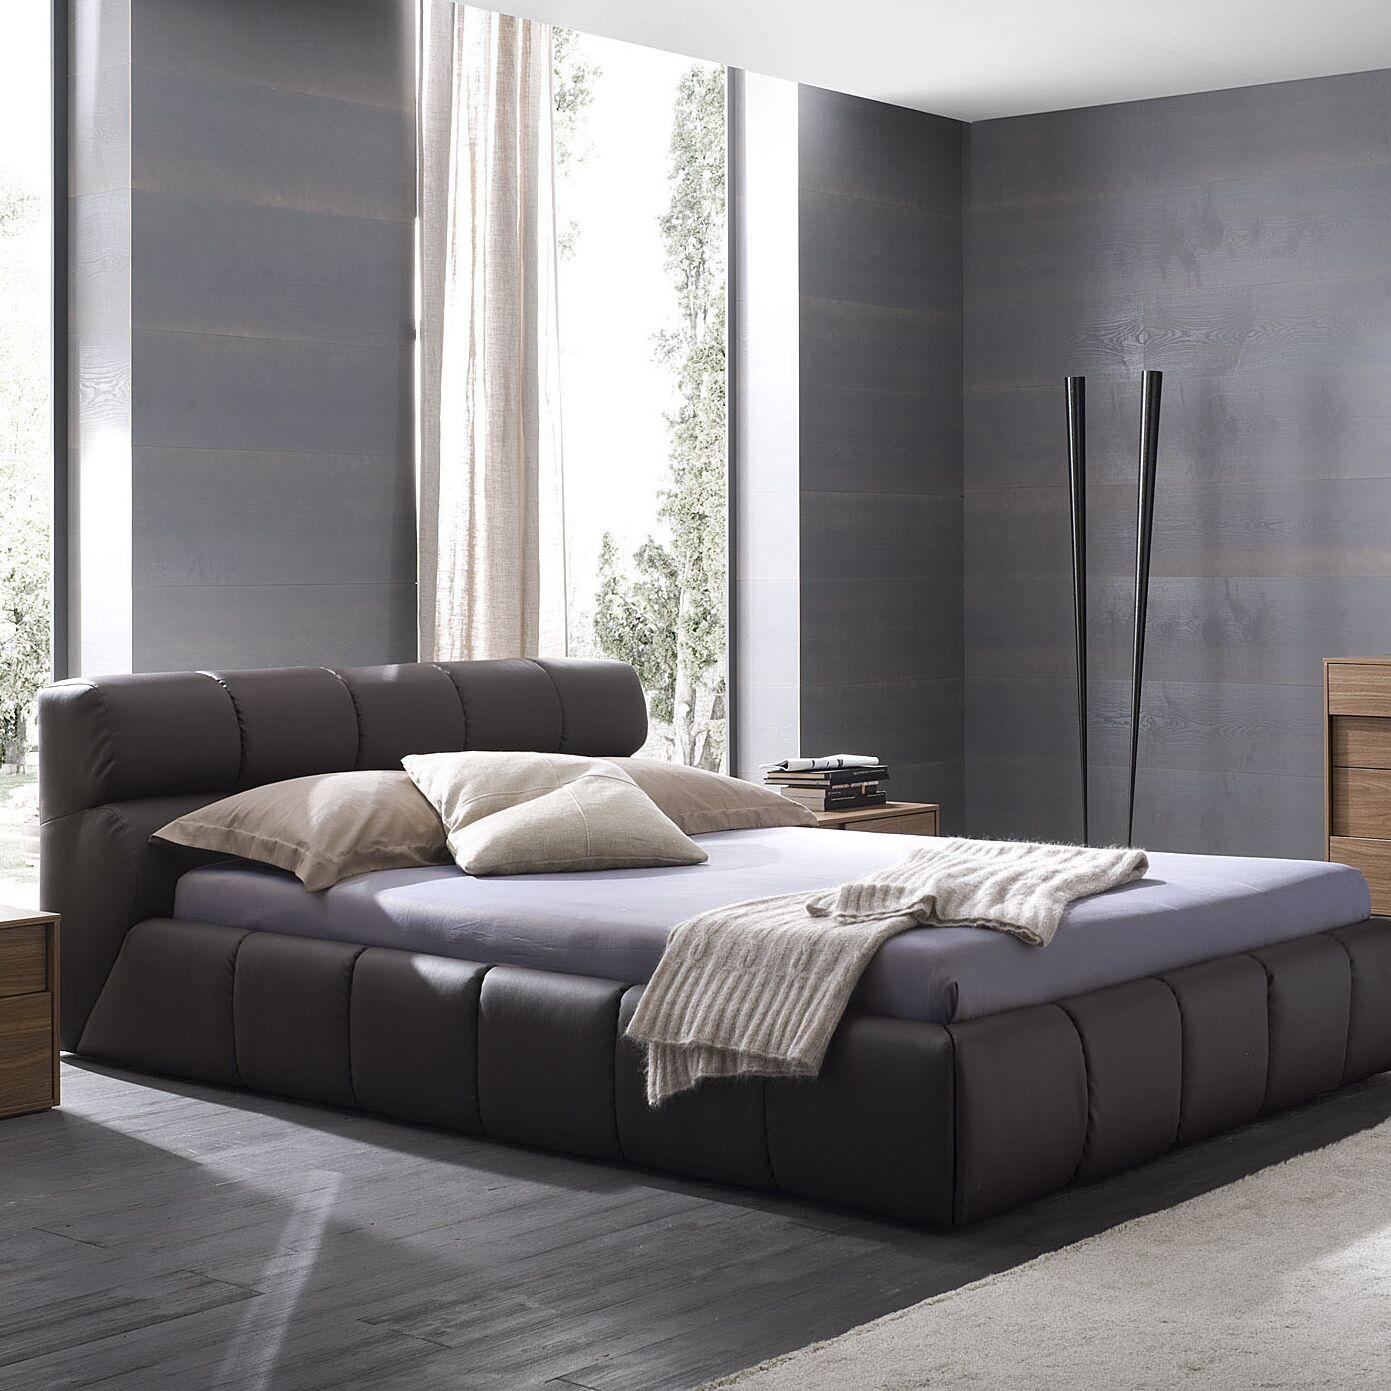 Cloud Upholstered Platform Bed Size: Queen, Color: Brown